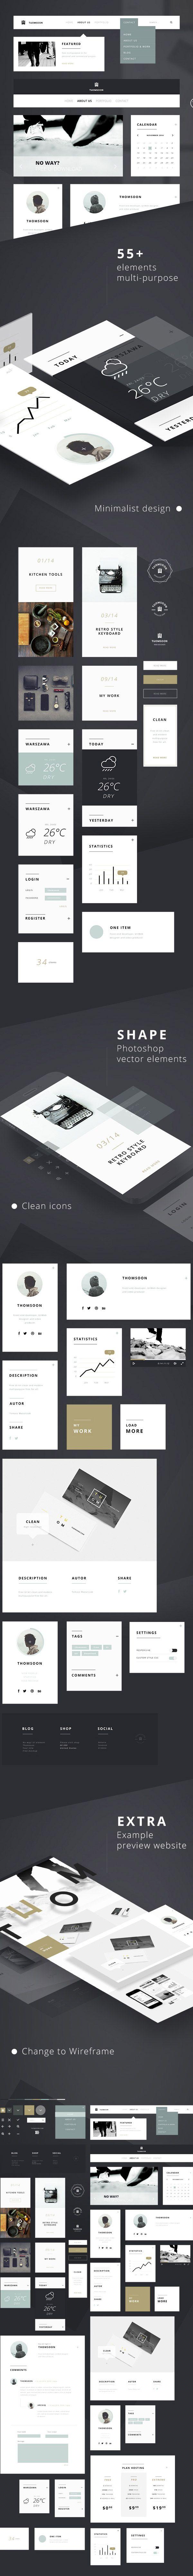 55+ FREE UI Elements PSD